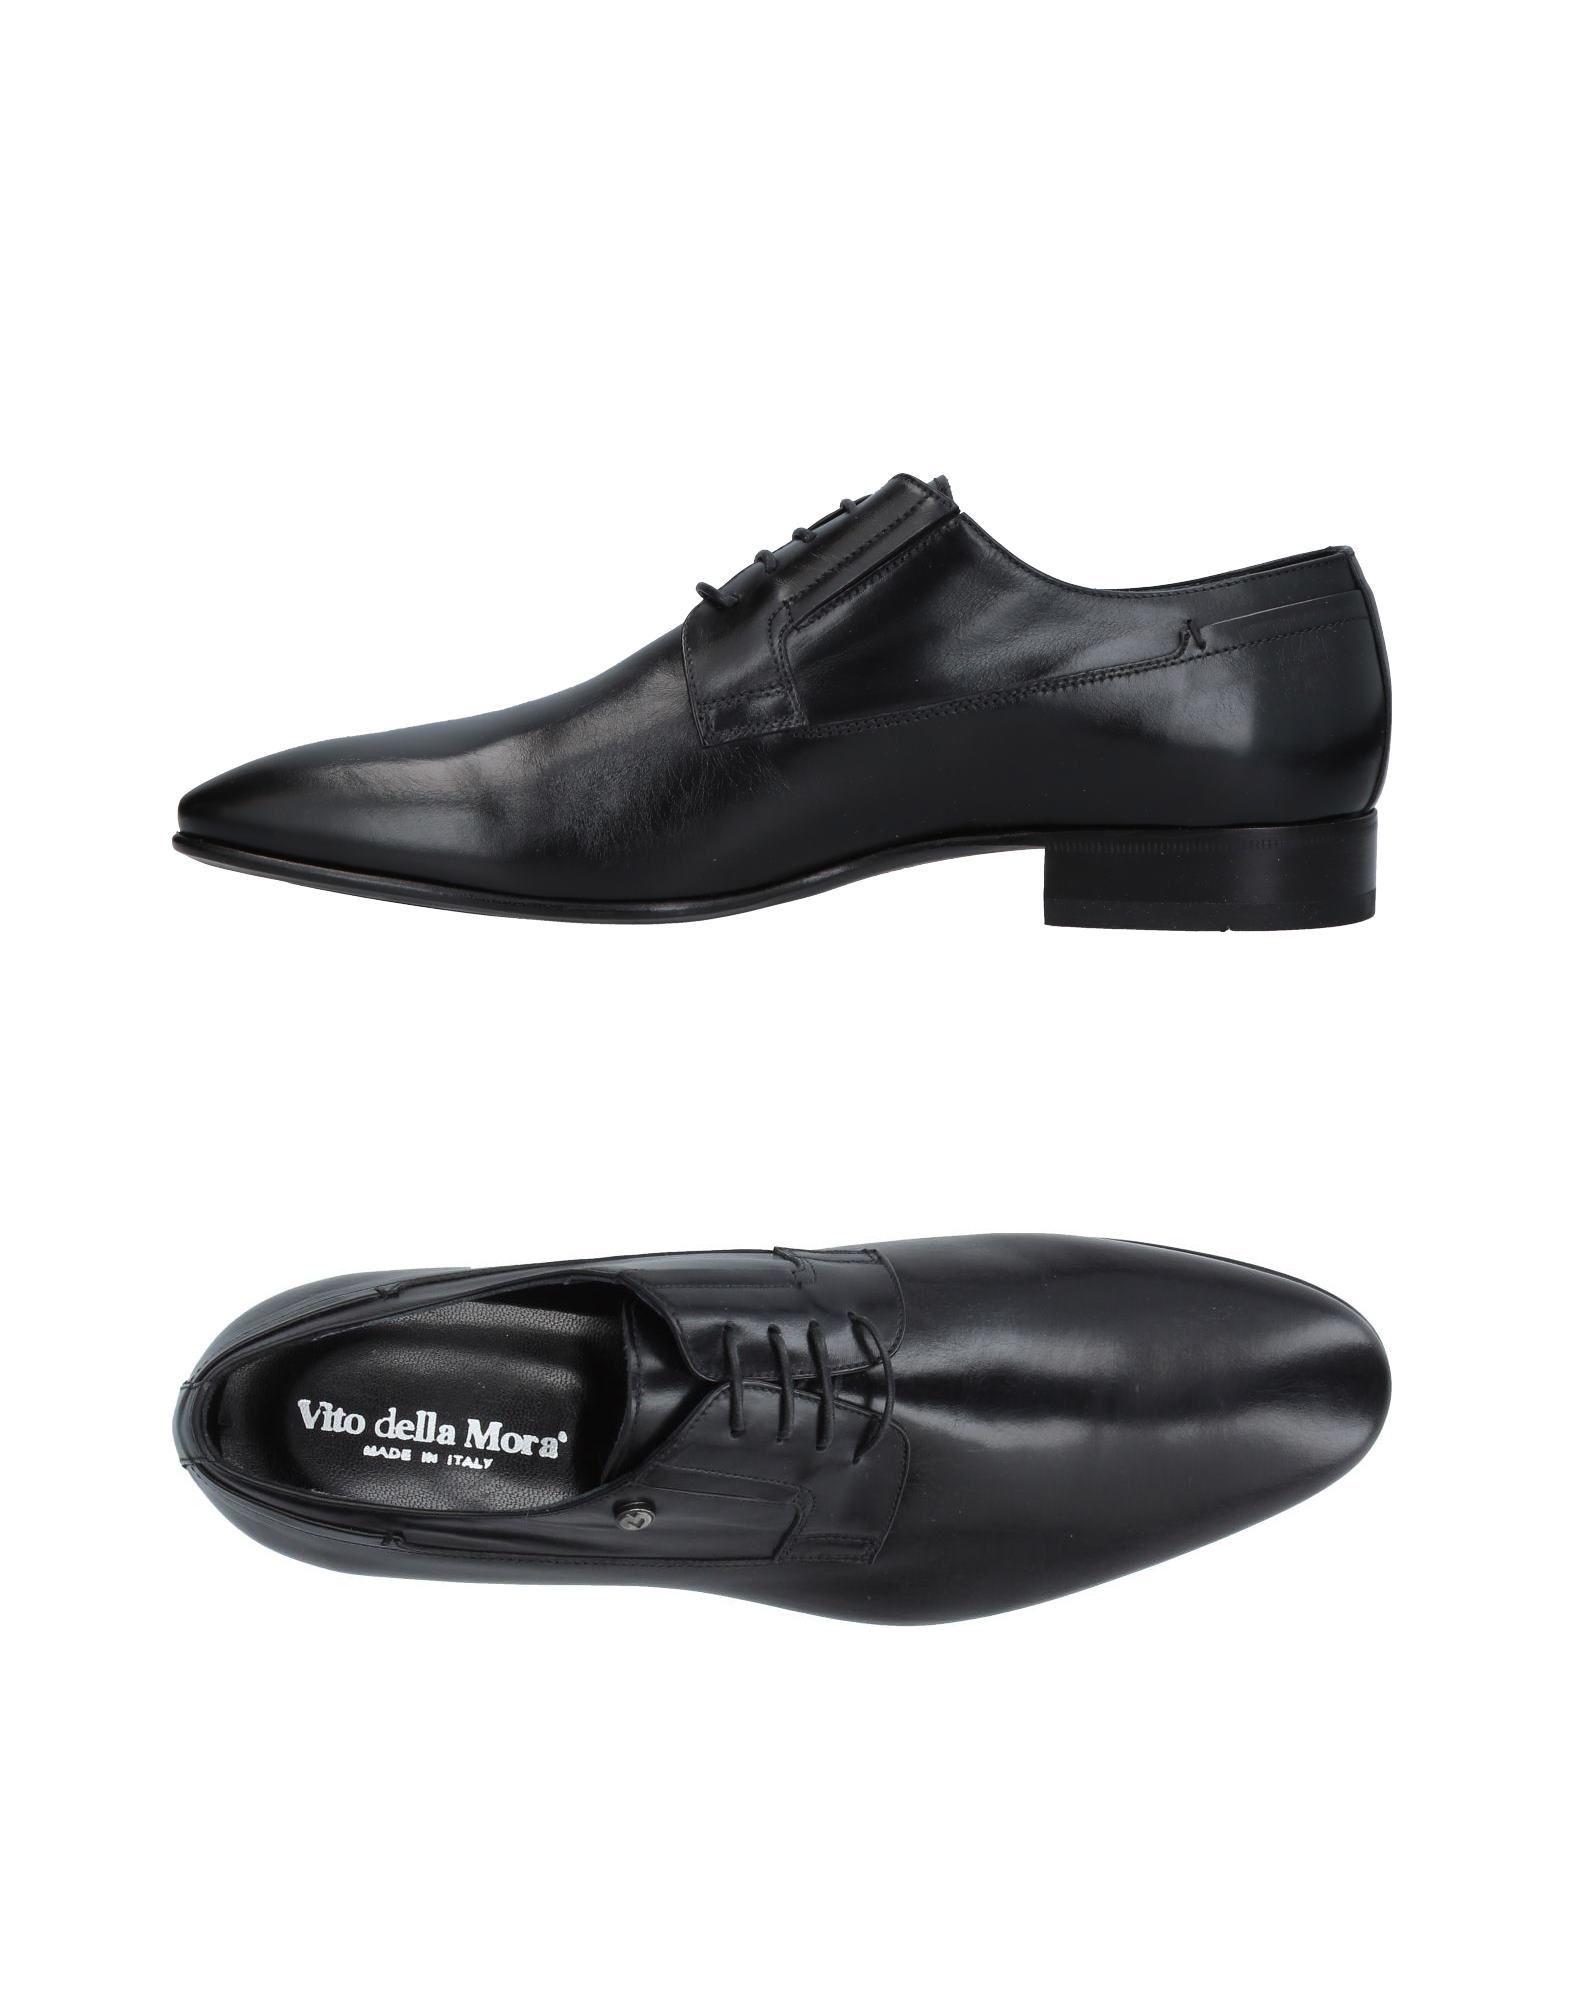 Chaussures À Lacets Vito Della Mora Femme - Chaussures À Lacets Vito Della Mora sur